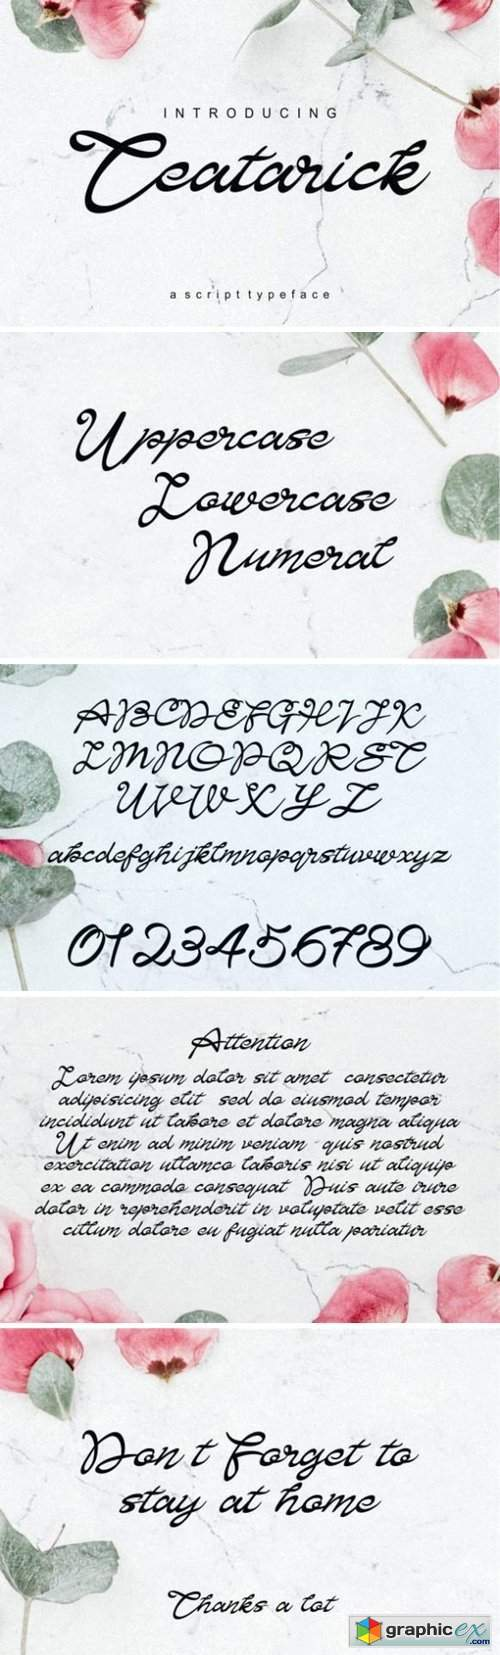 Teatarick Font